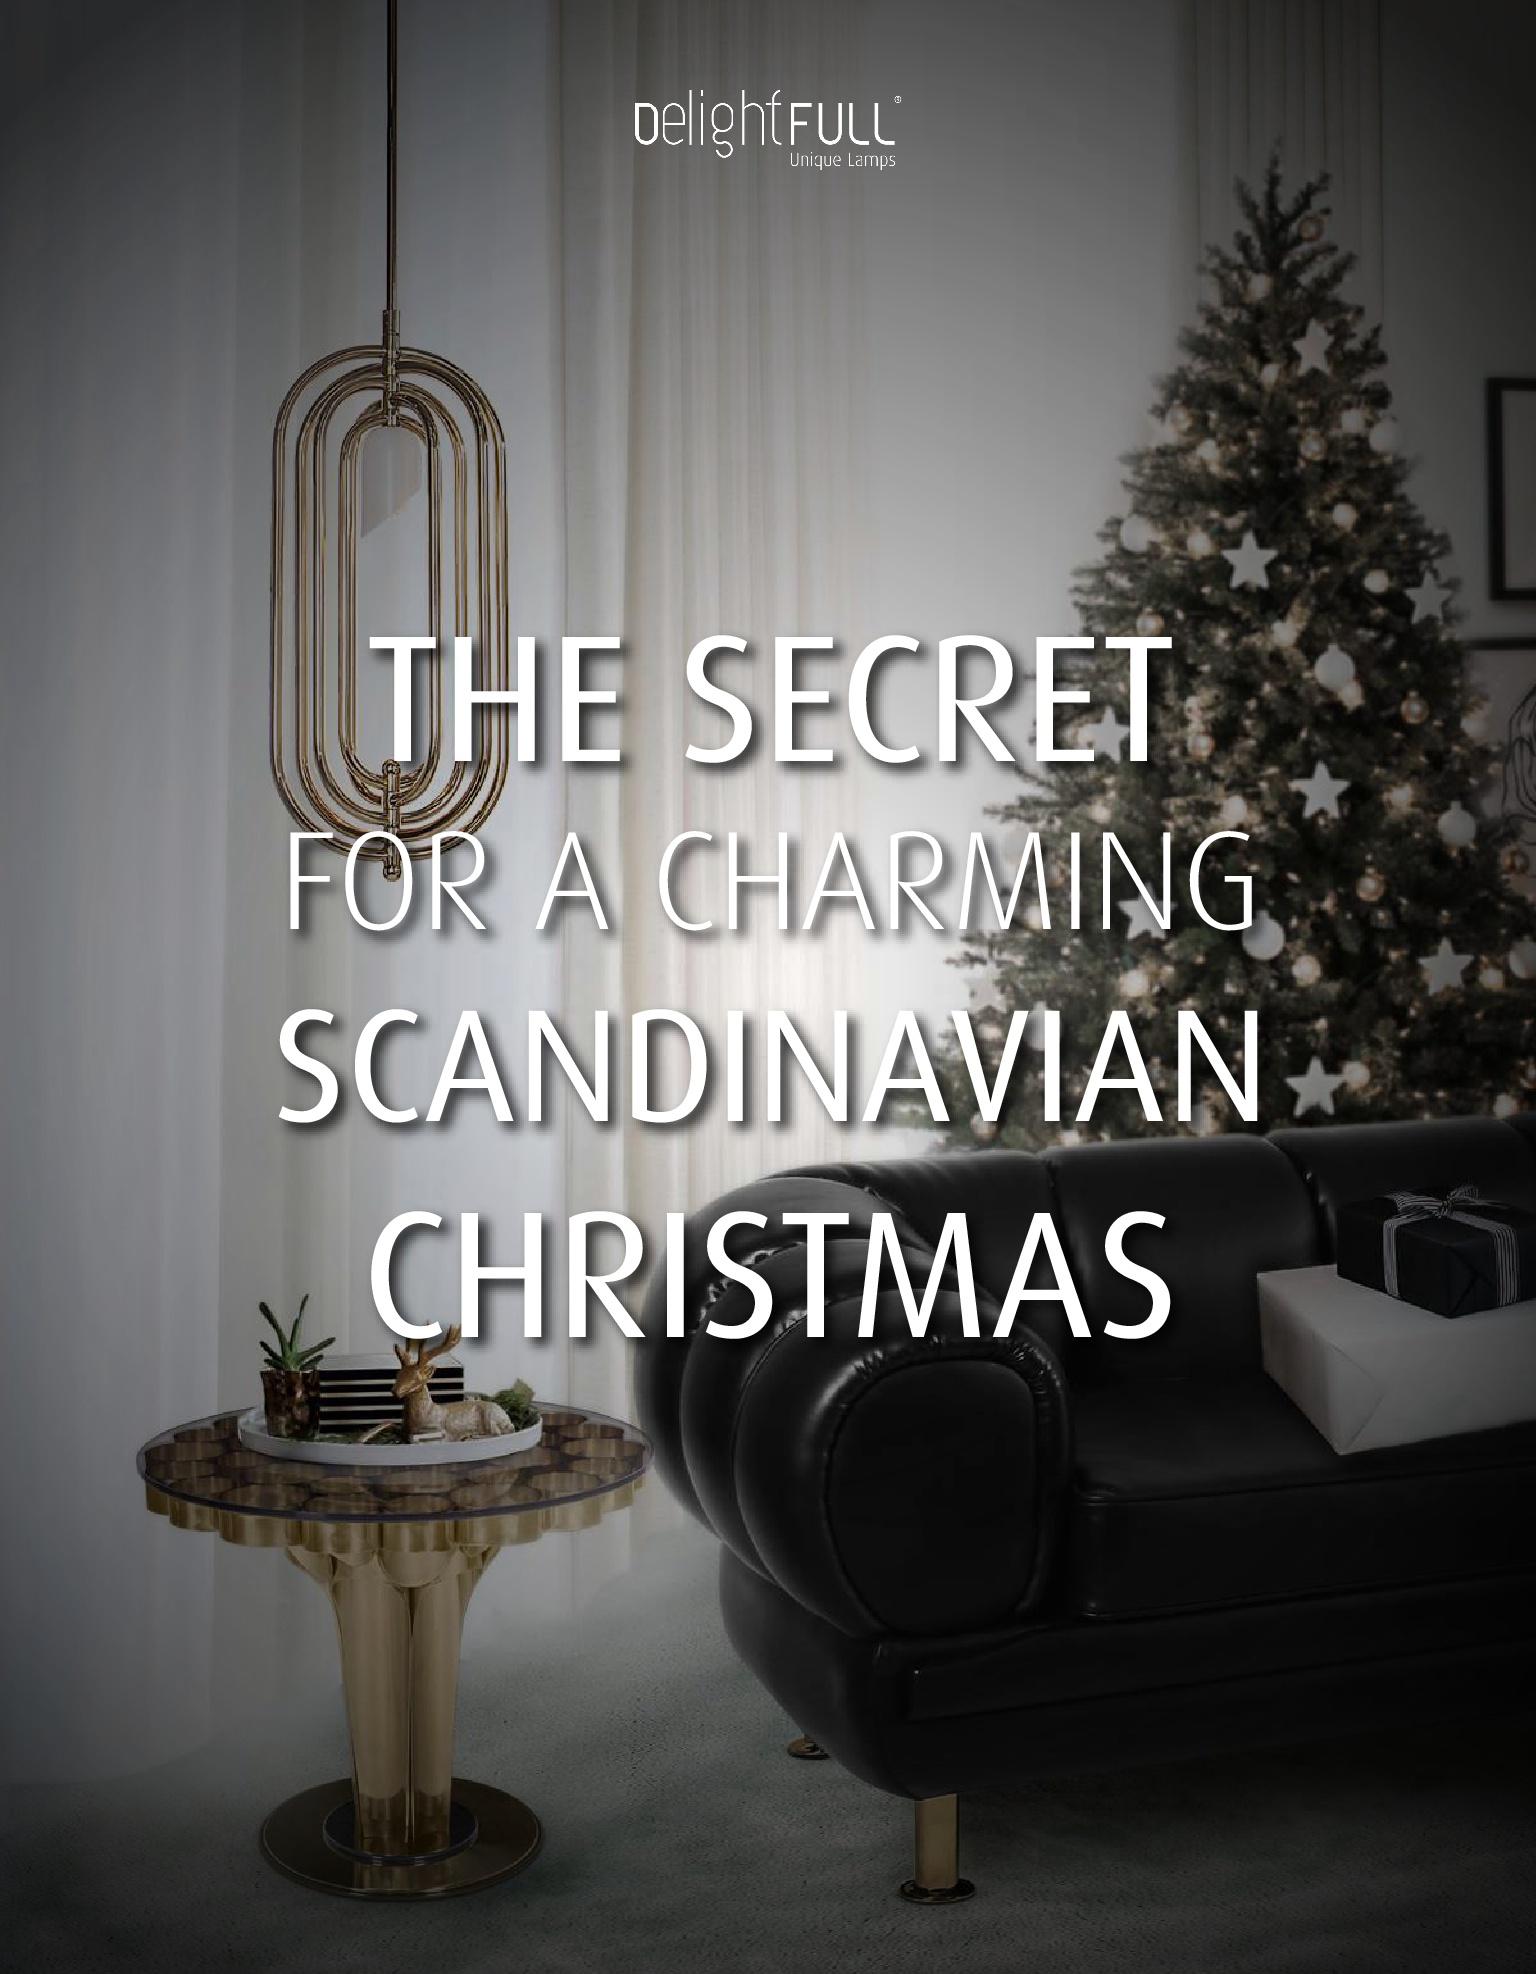 New Ebook The Secret for a Charming Scandinavian Christmas FEAT (2)